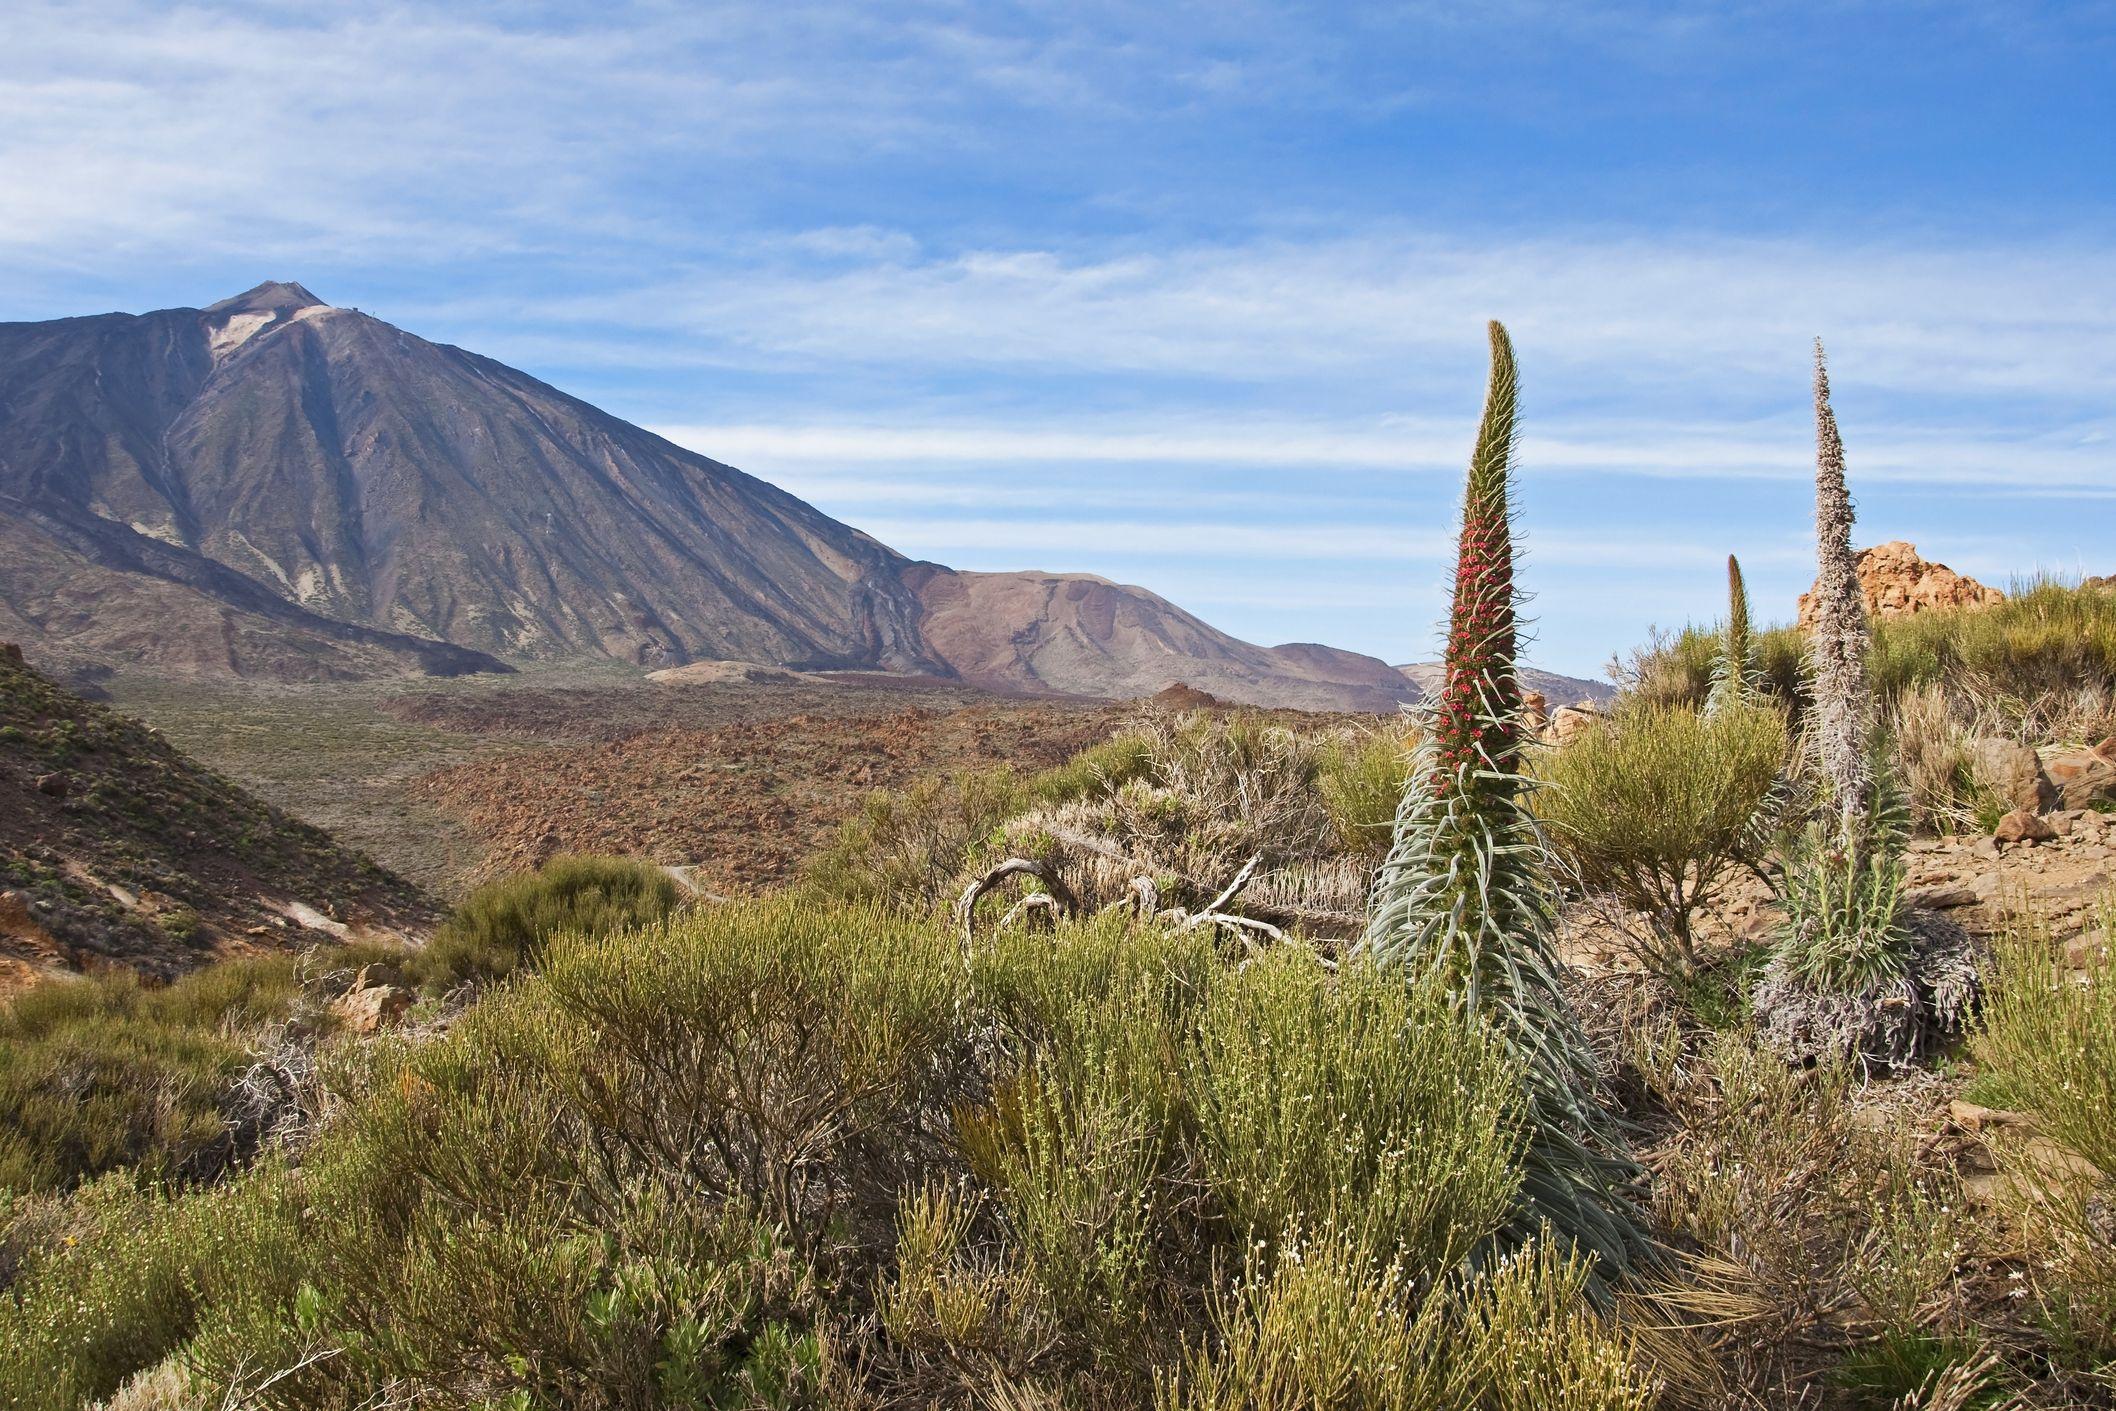 Spain, Canary Islands, Tenerife, Los Roques de Garcia, Mount Teide, Teide National Park, Echium Wildpretii